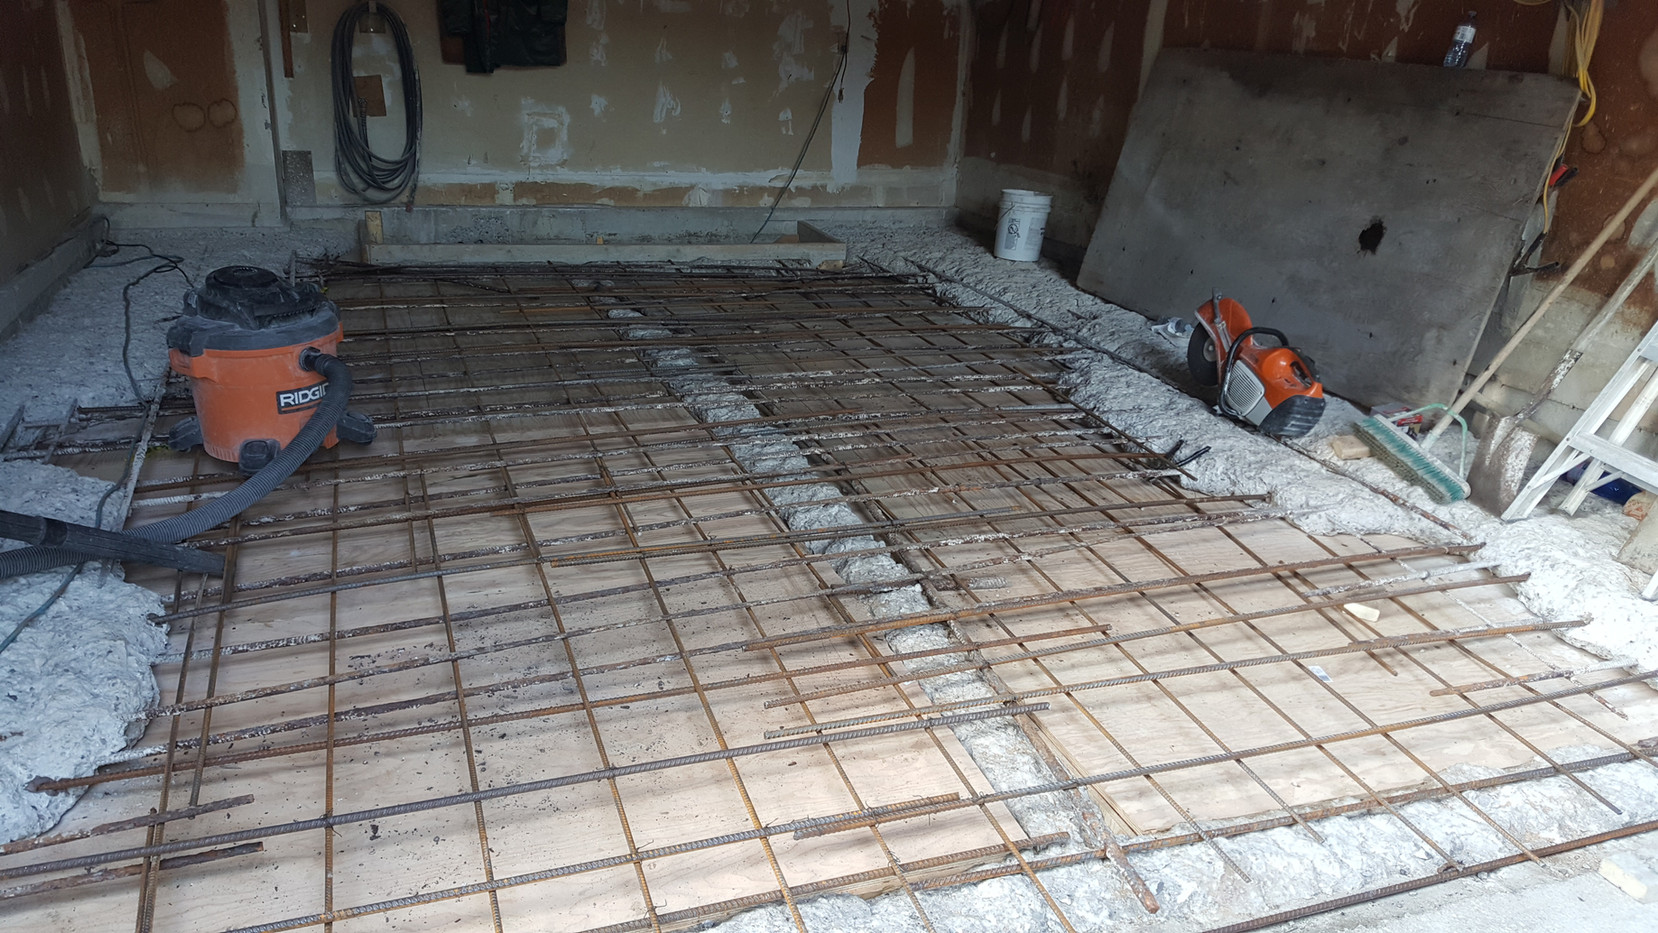 preparing for concrete pour